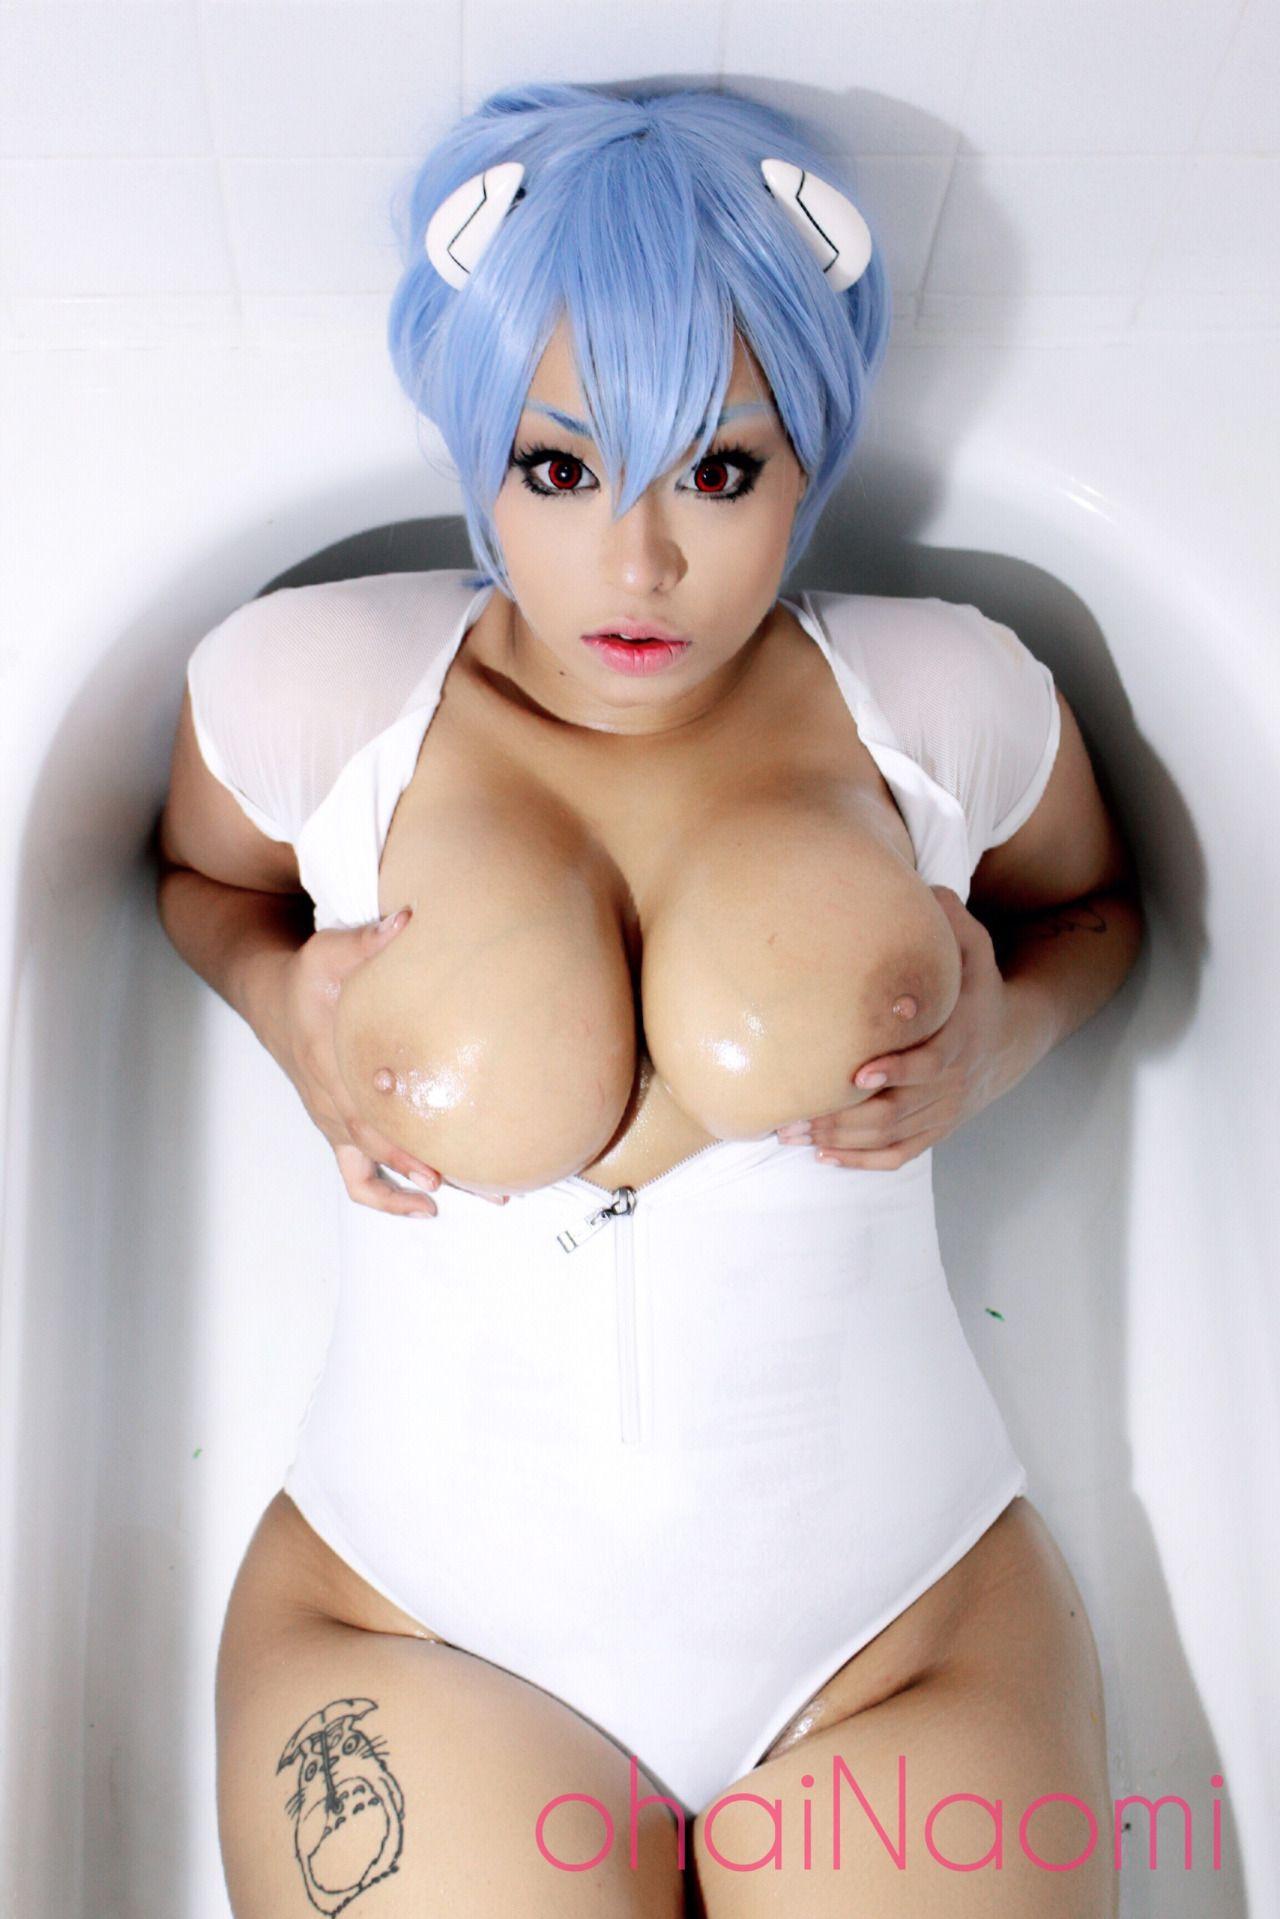 Big boobs and ass blue yoga pants